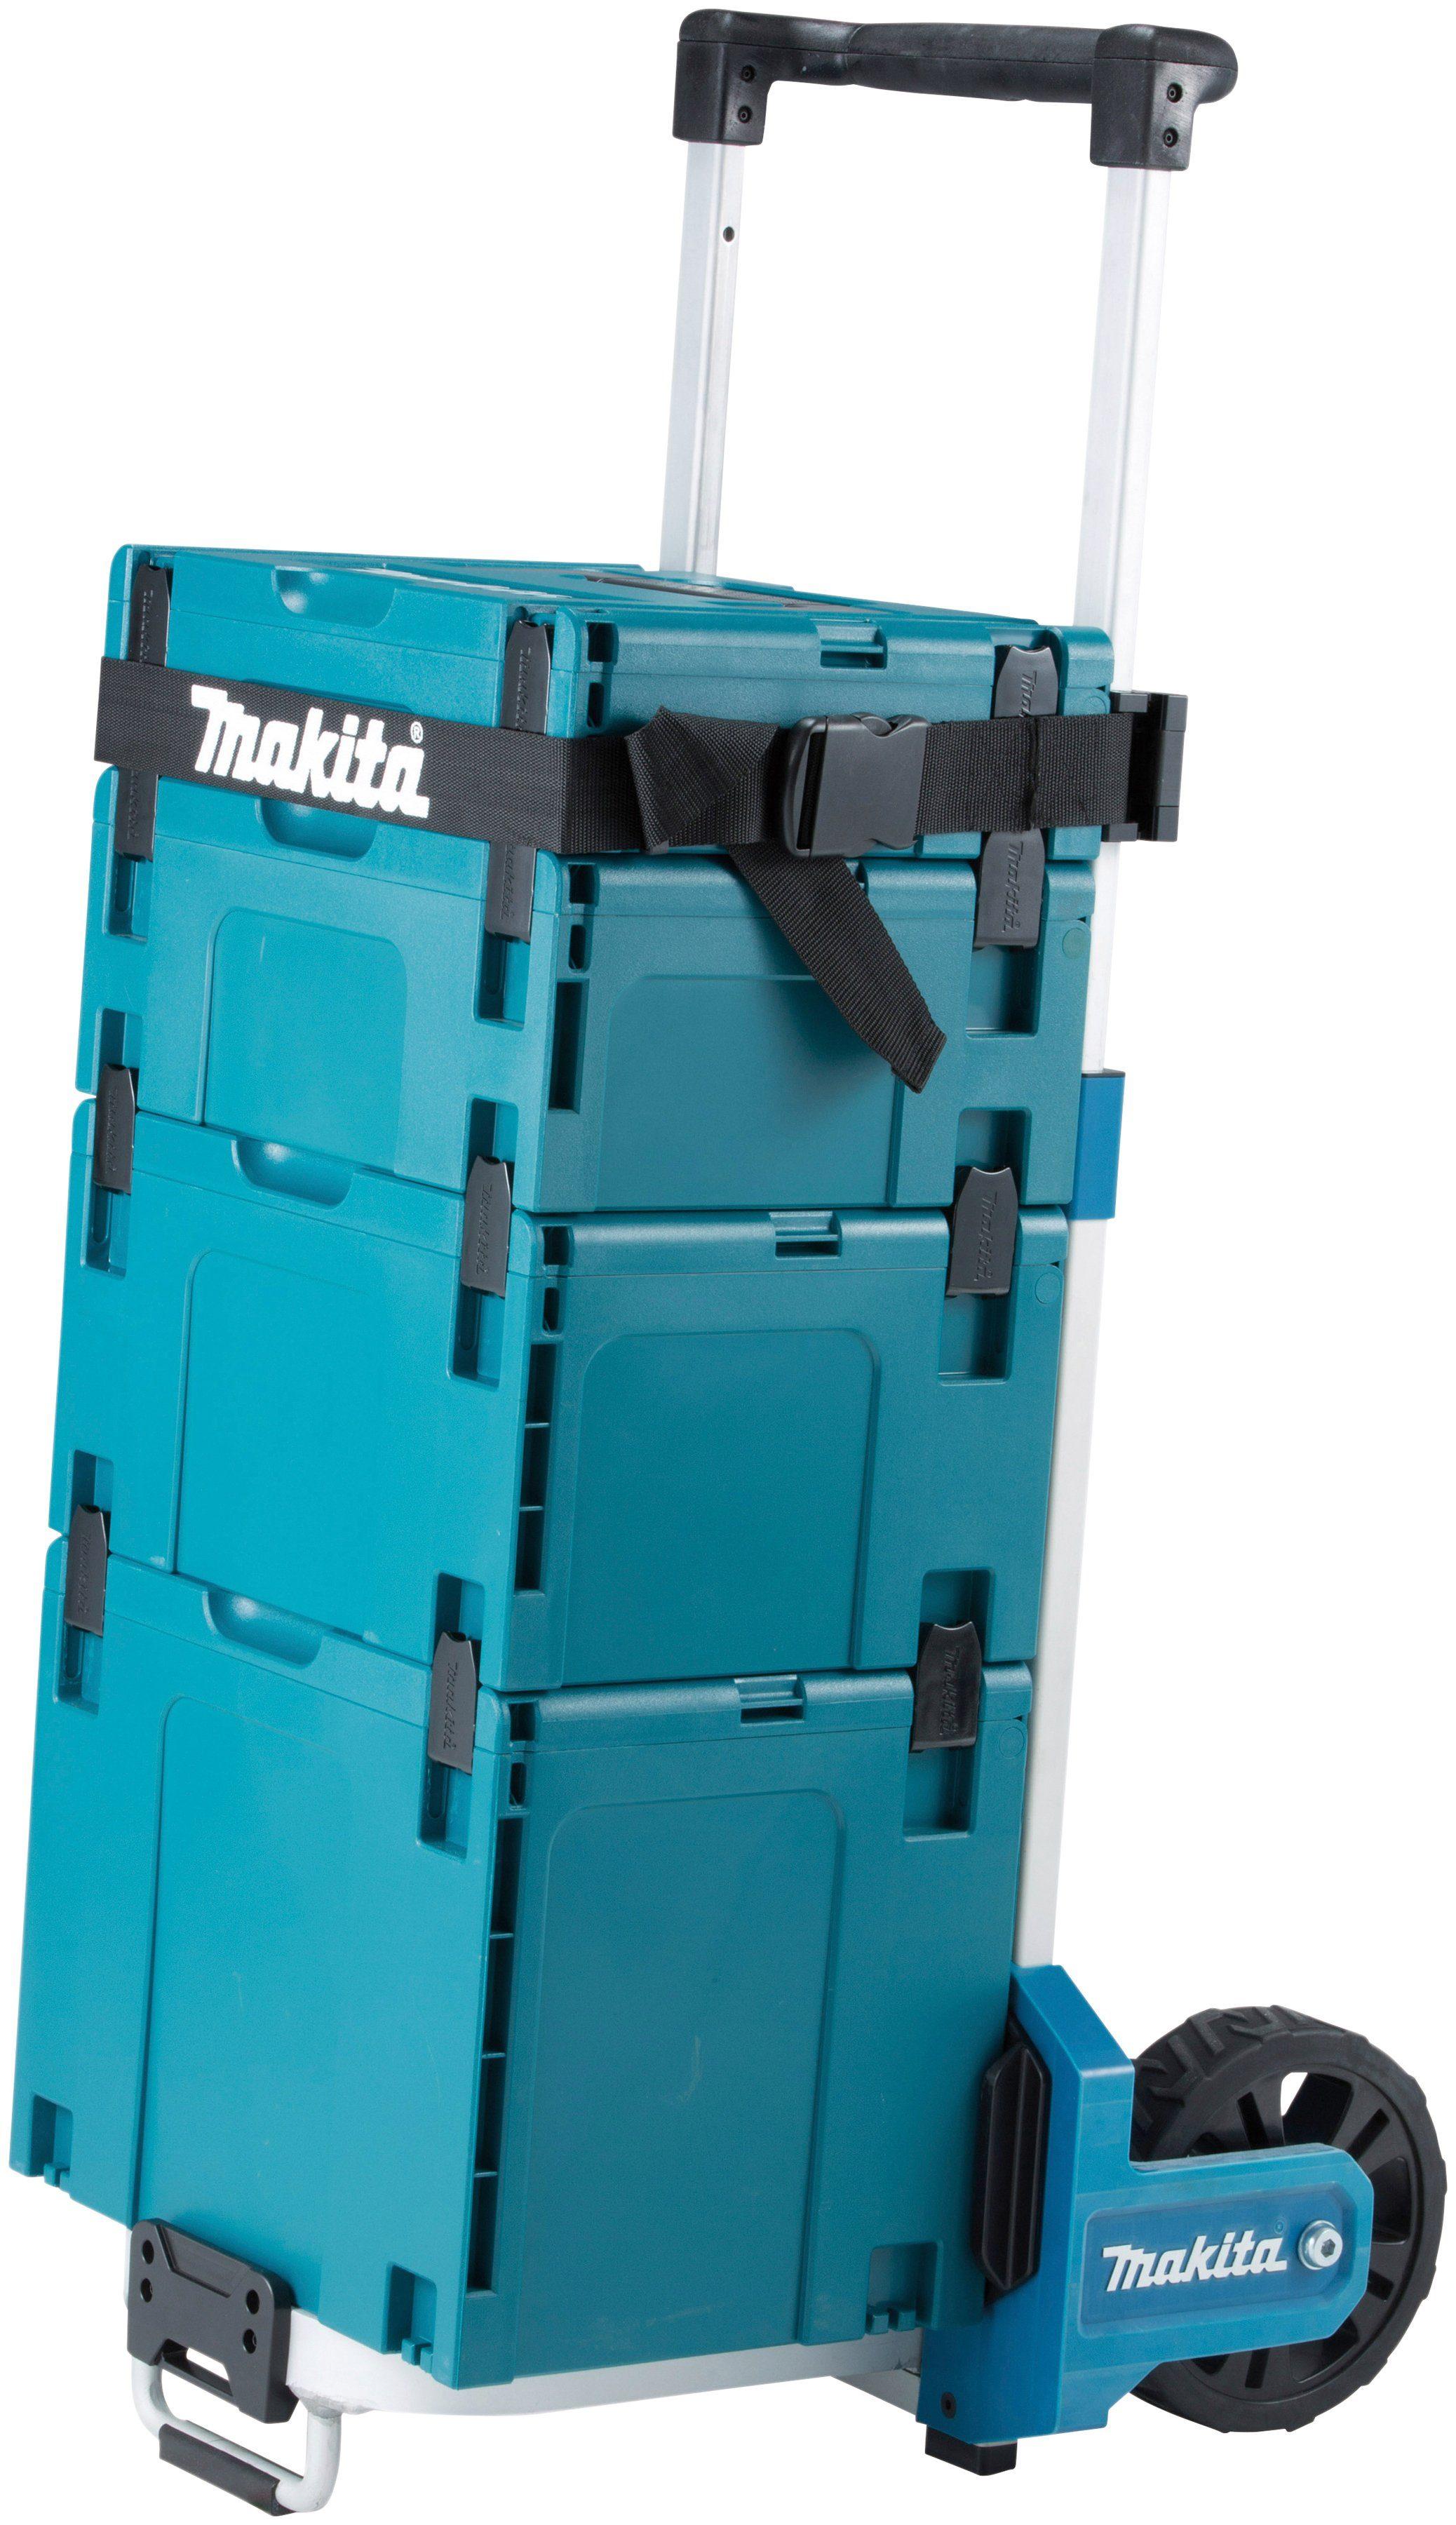 MAKITA Werkzeugtrolley »TR00000001«, 57x50x112 cm, faltbar